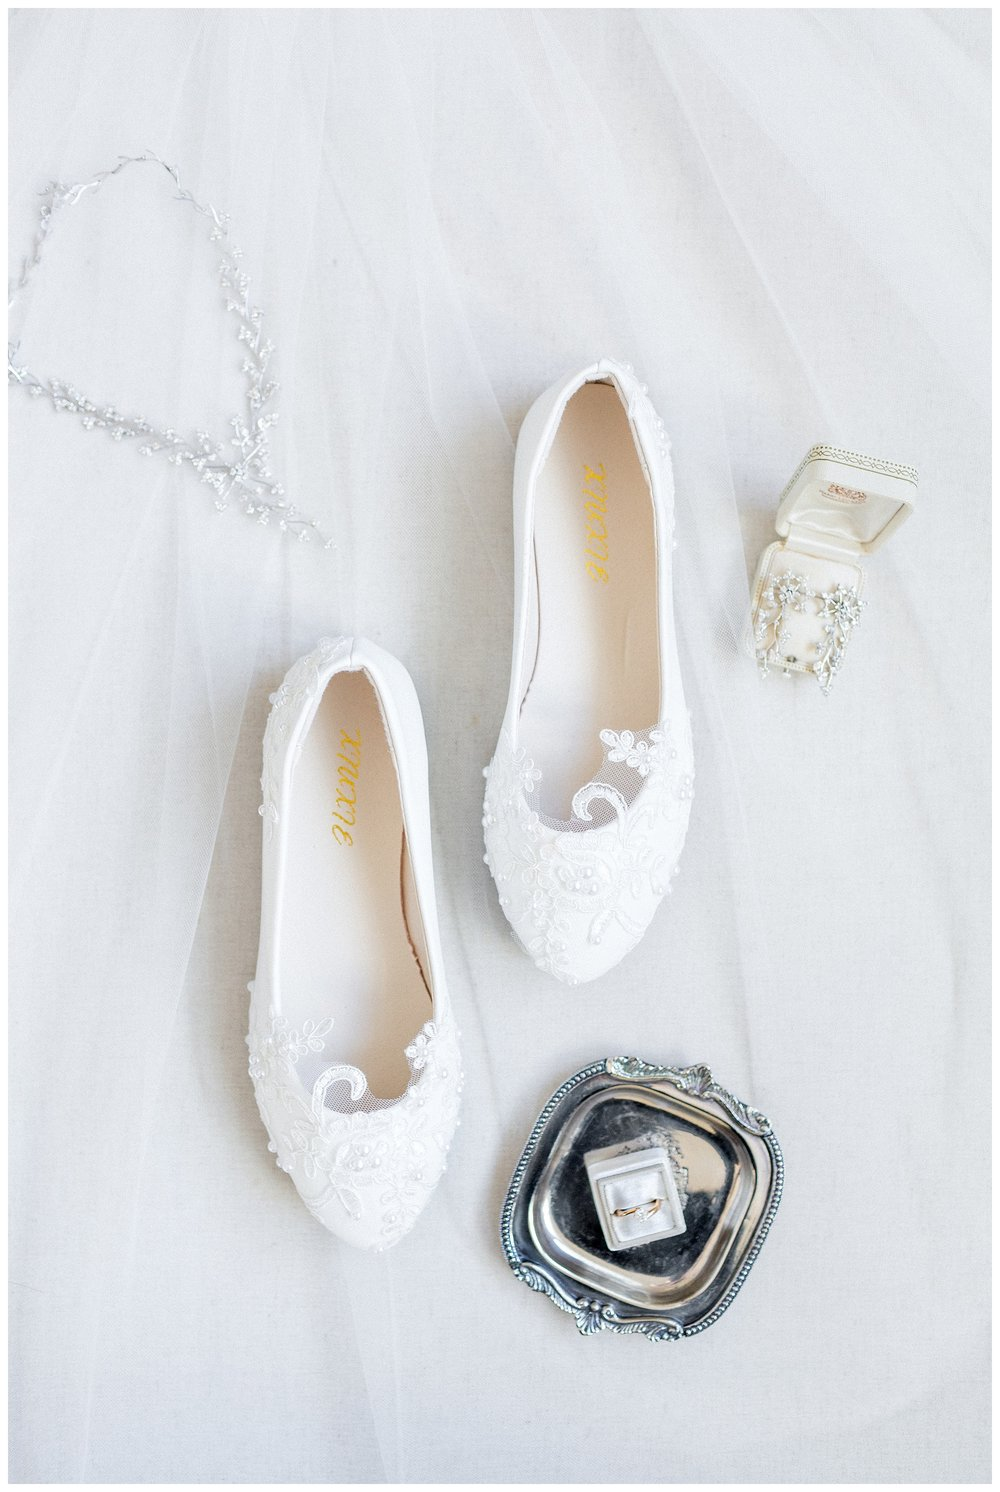 Stone Tower Winery Wedding | Virginia Winter Wedding | VA Wedding Photographer Kir Tuben_0013.jpg